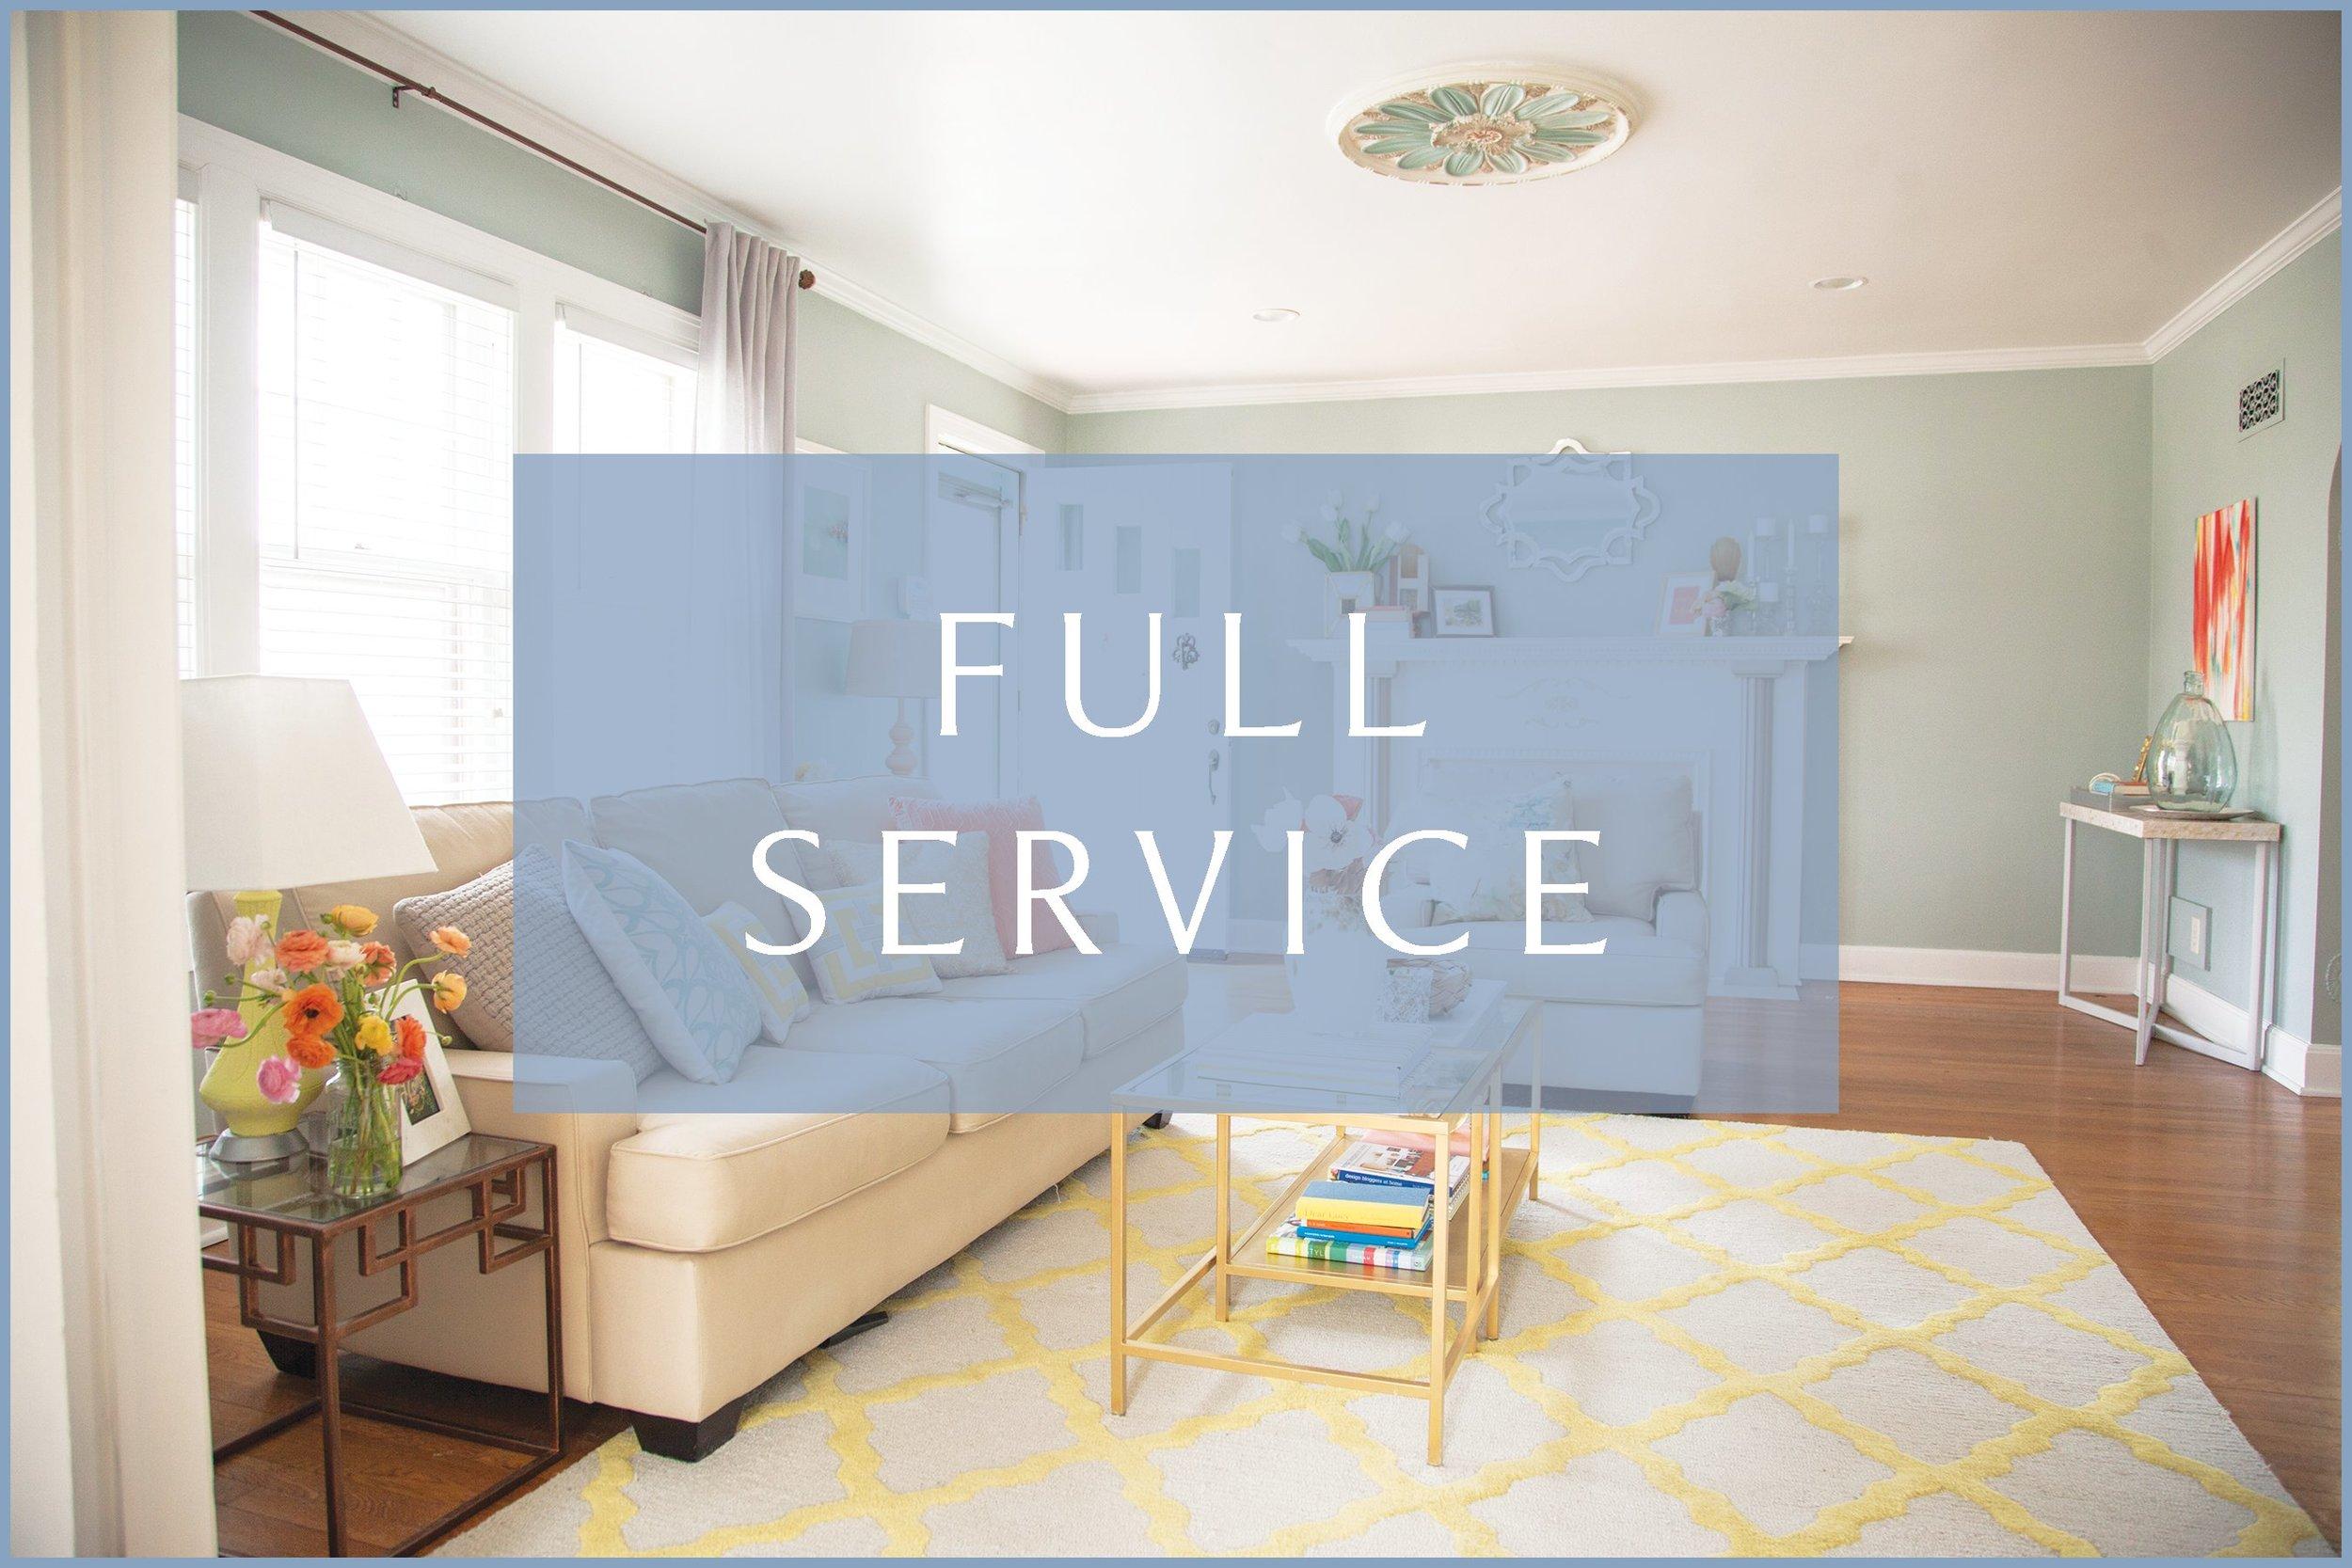 Website Services Full Service.jpg